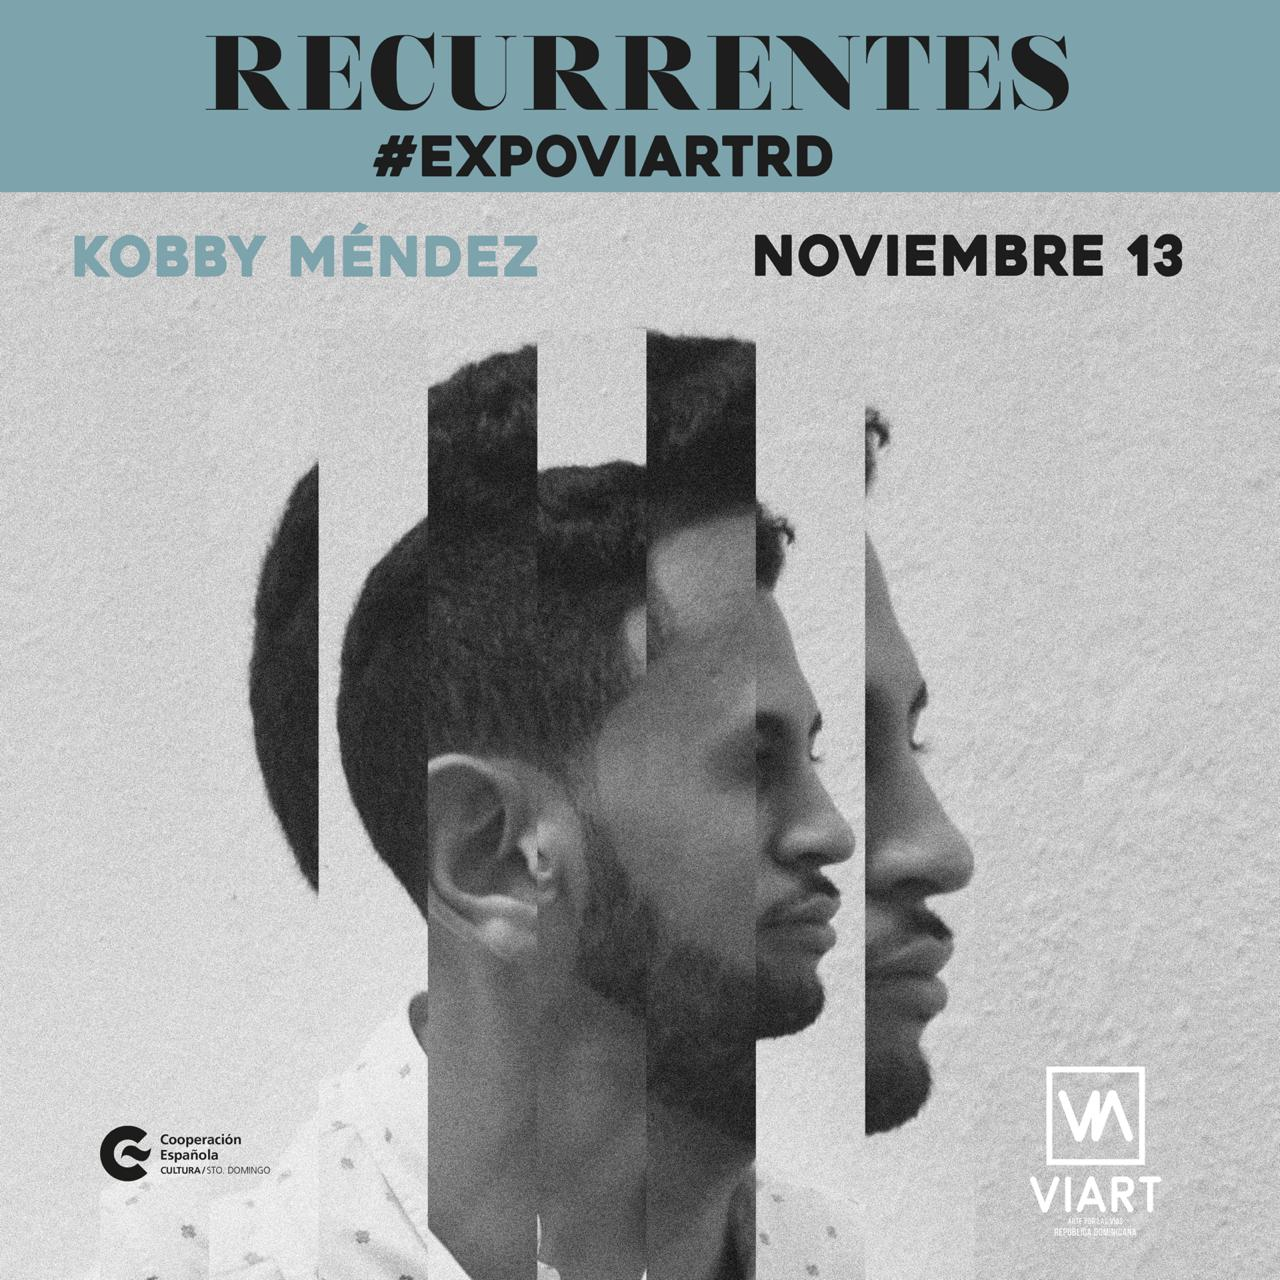 Kobby_Mendez_recurrentes